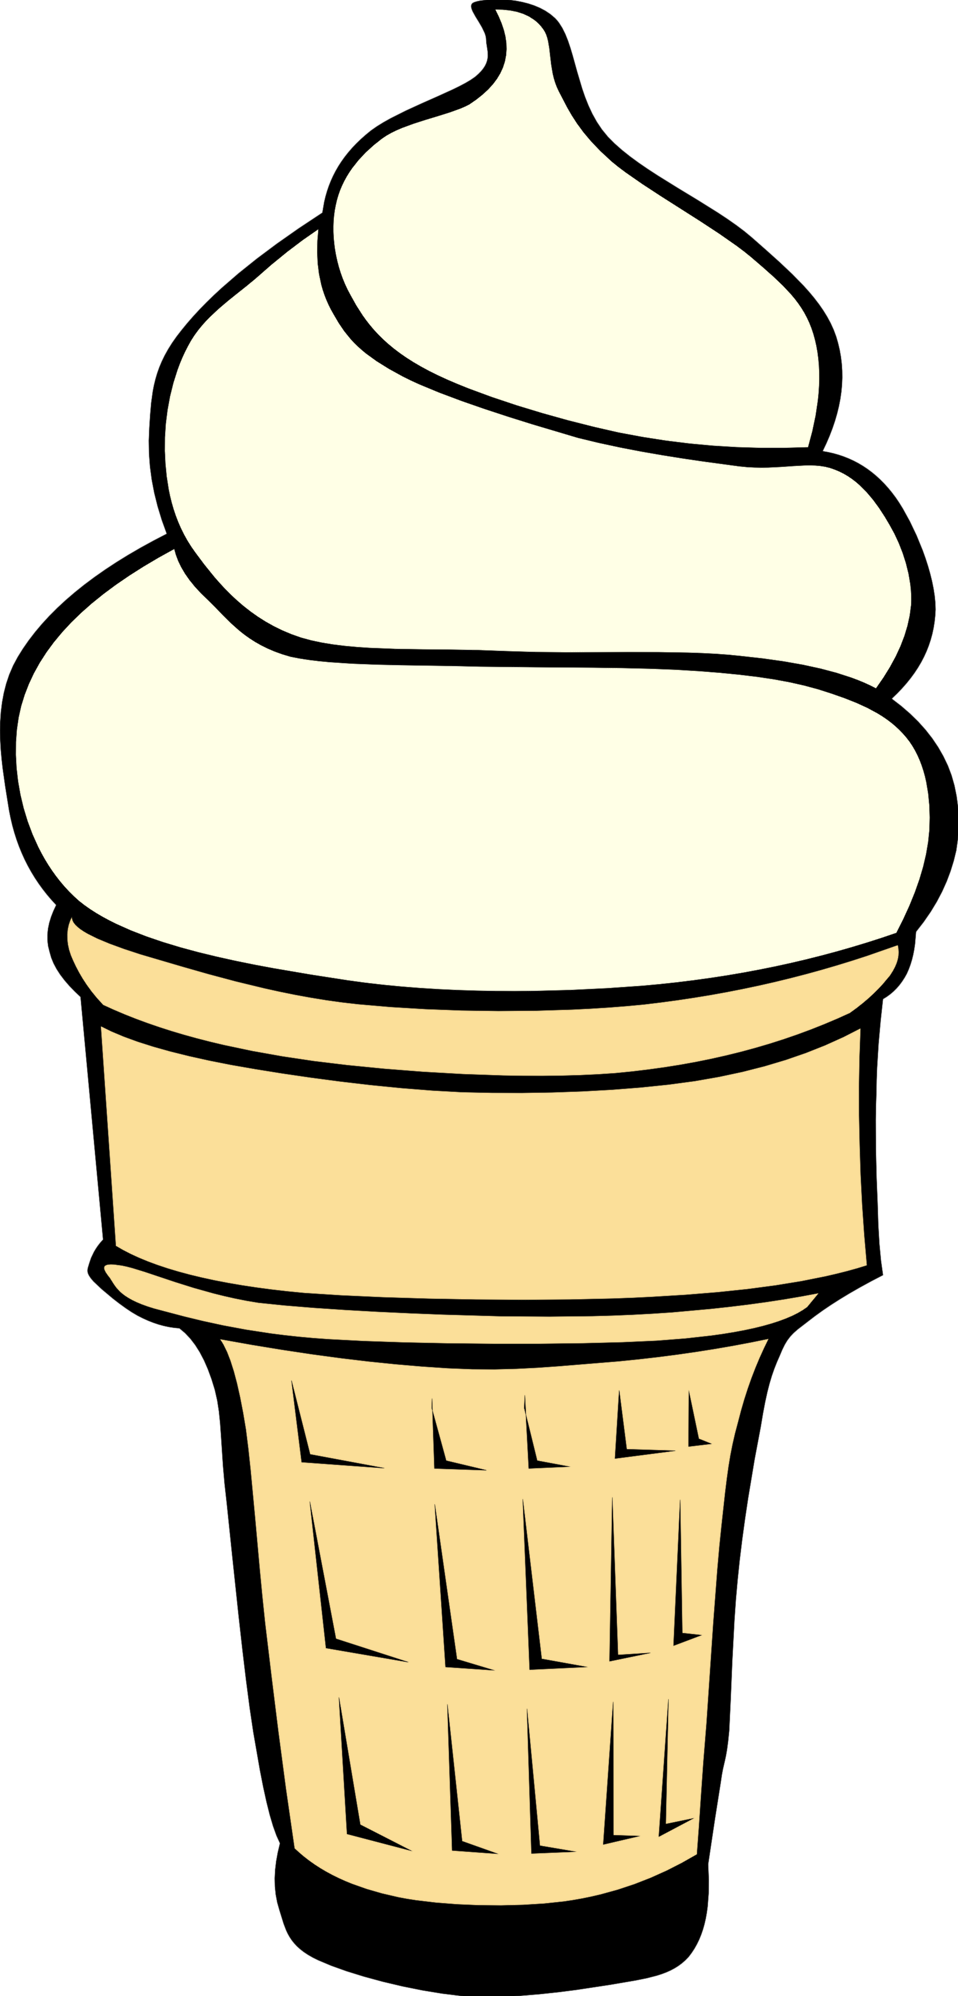 Fast Food, Desserts, Ice Cream Cones, Soft Serve